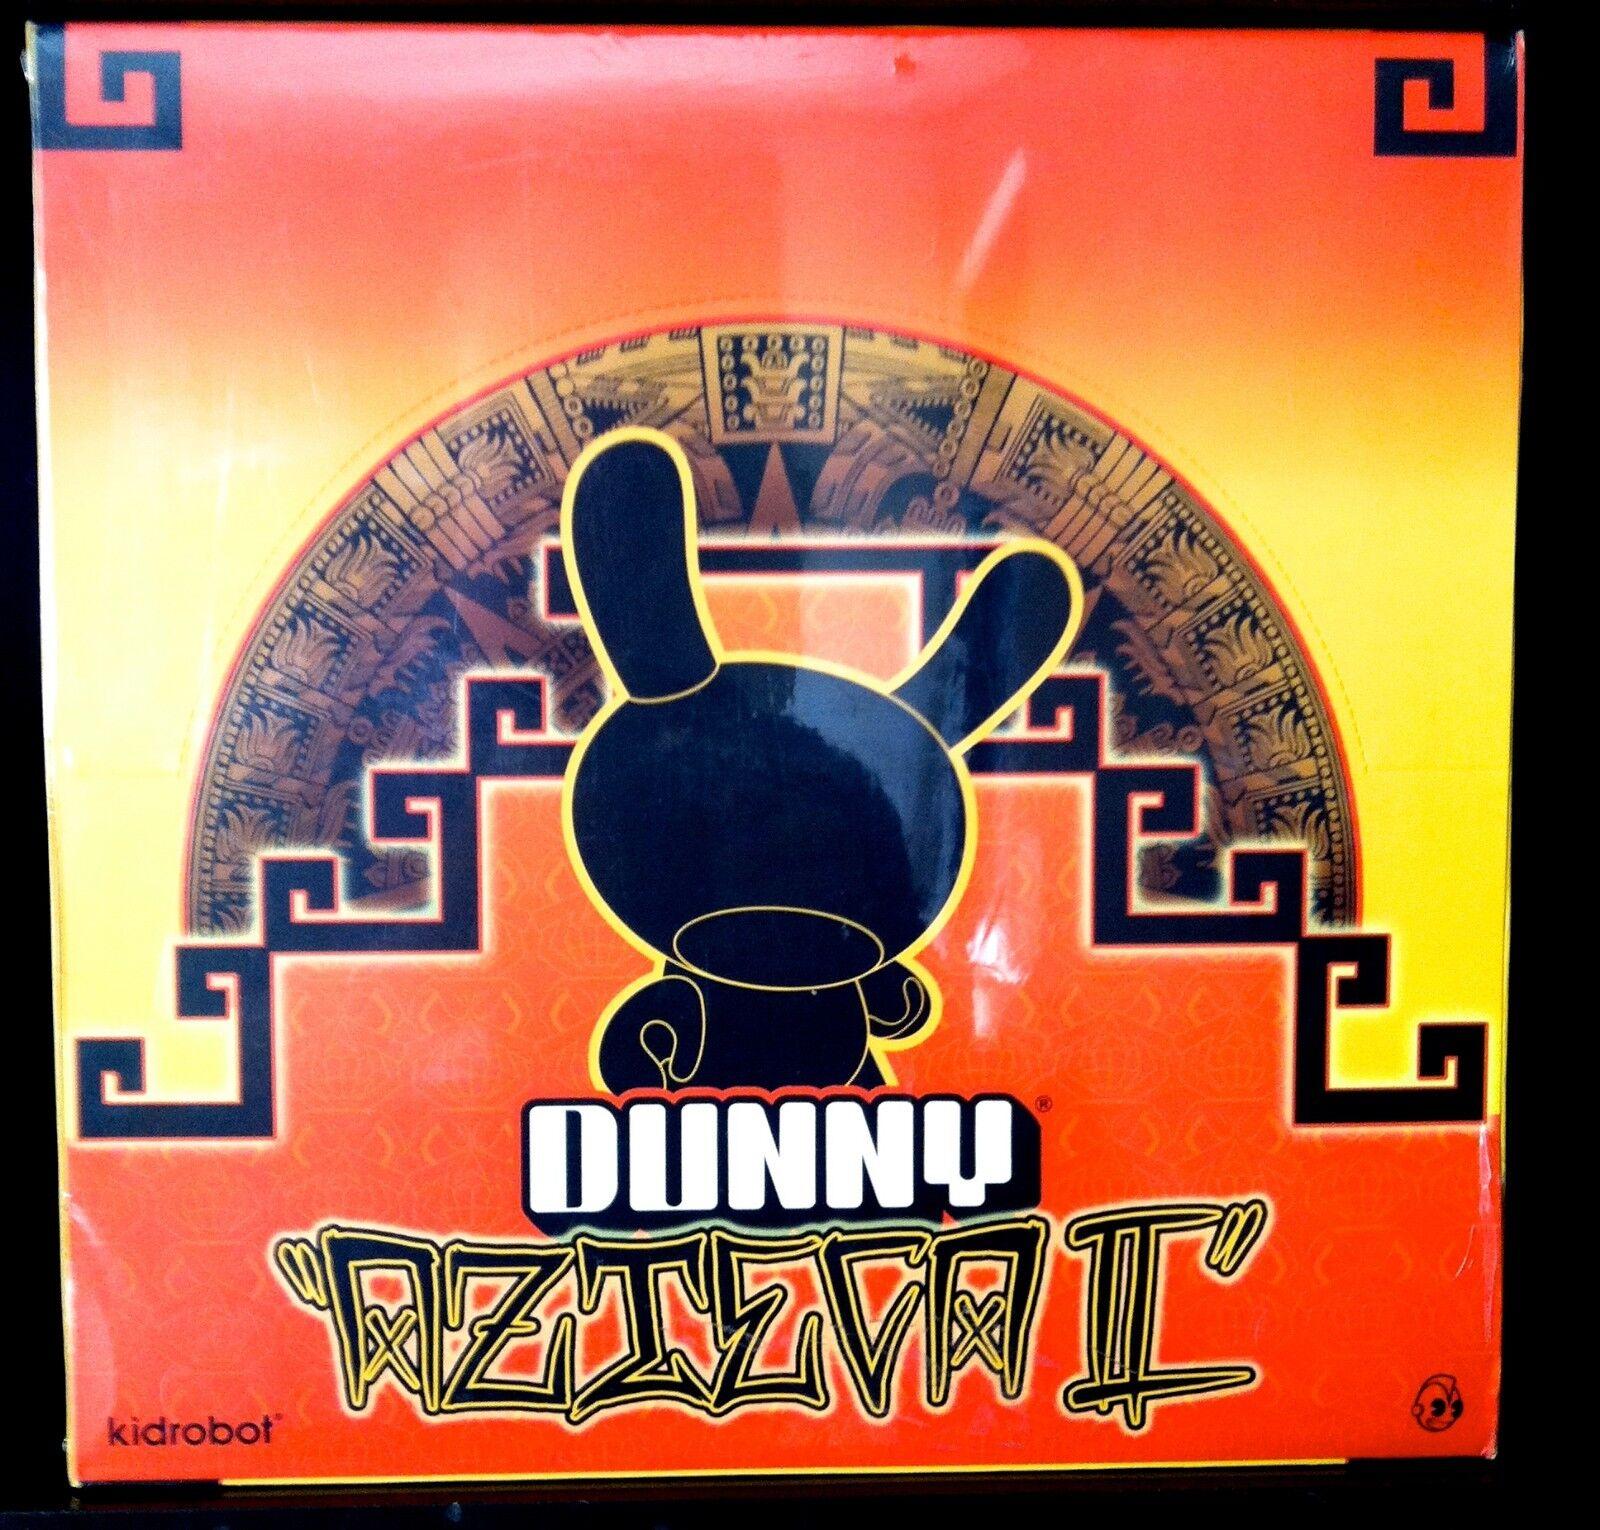 Dunny Azteca 2 serie 3 CAJA PRECINTADA 25 Figuras de juguete de diseñador Kidrobot ciego